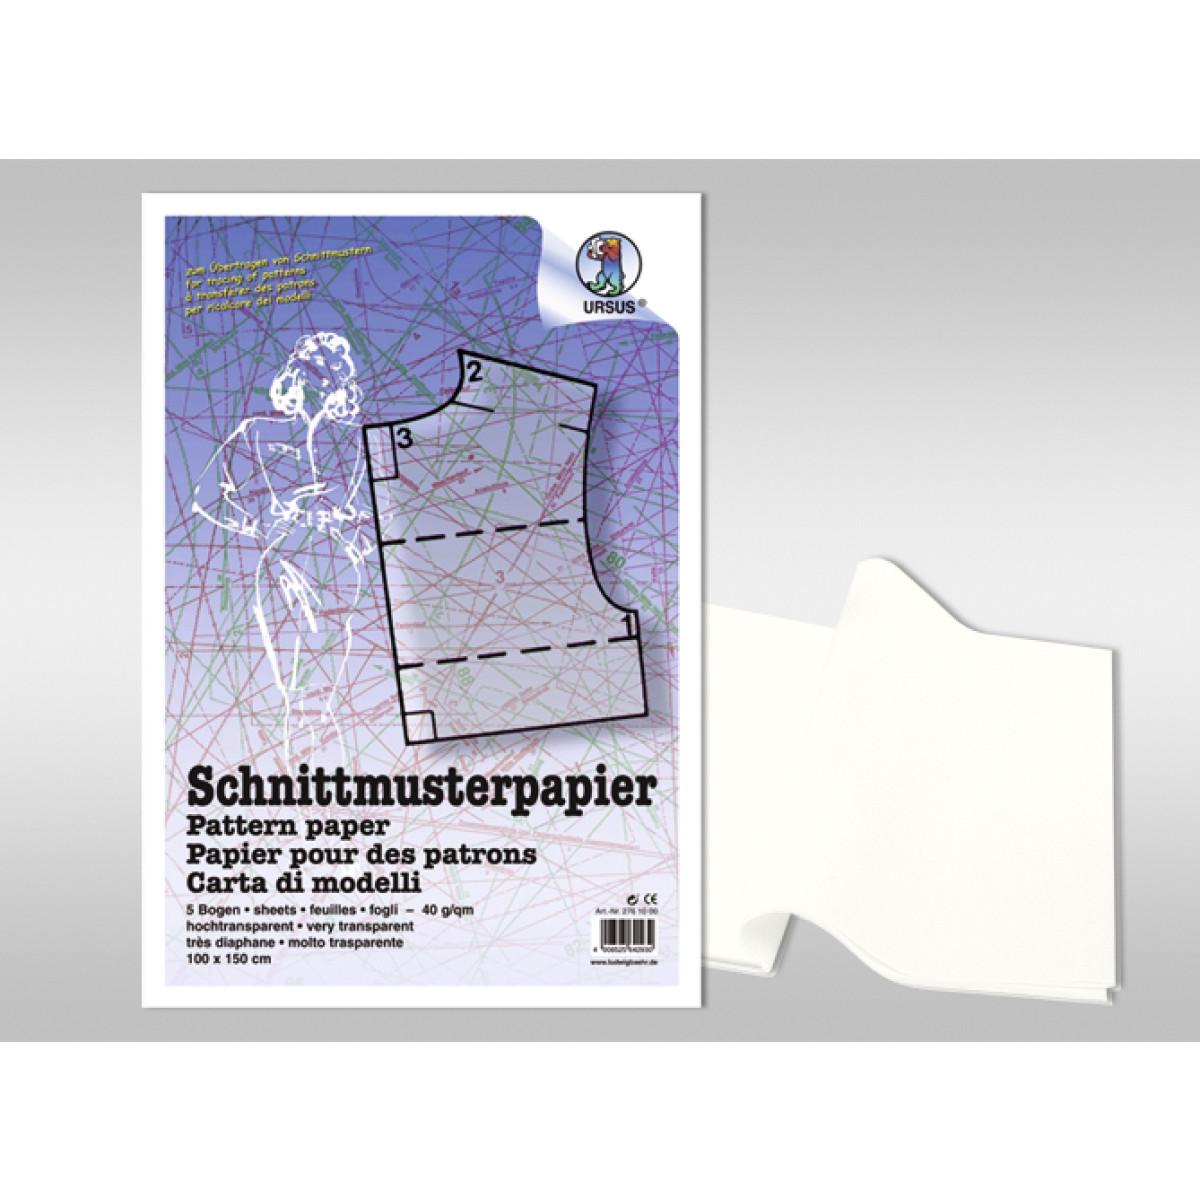 Schnittmusterpapier 40 g/qm 100 x 150 cm - 5 Bogen - Buntpapierwelt